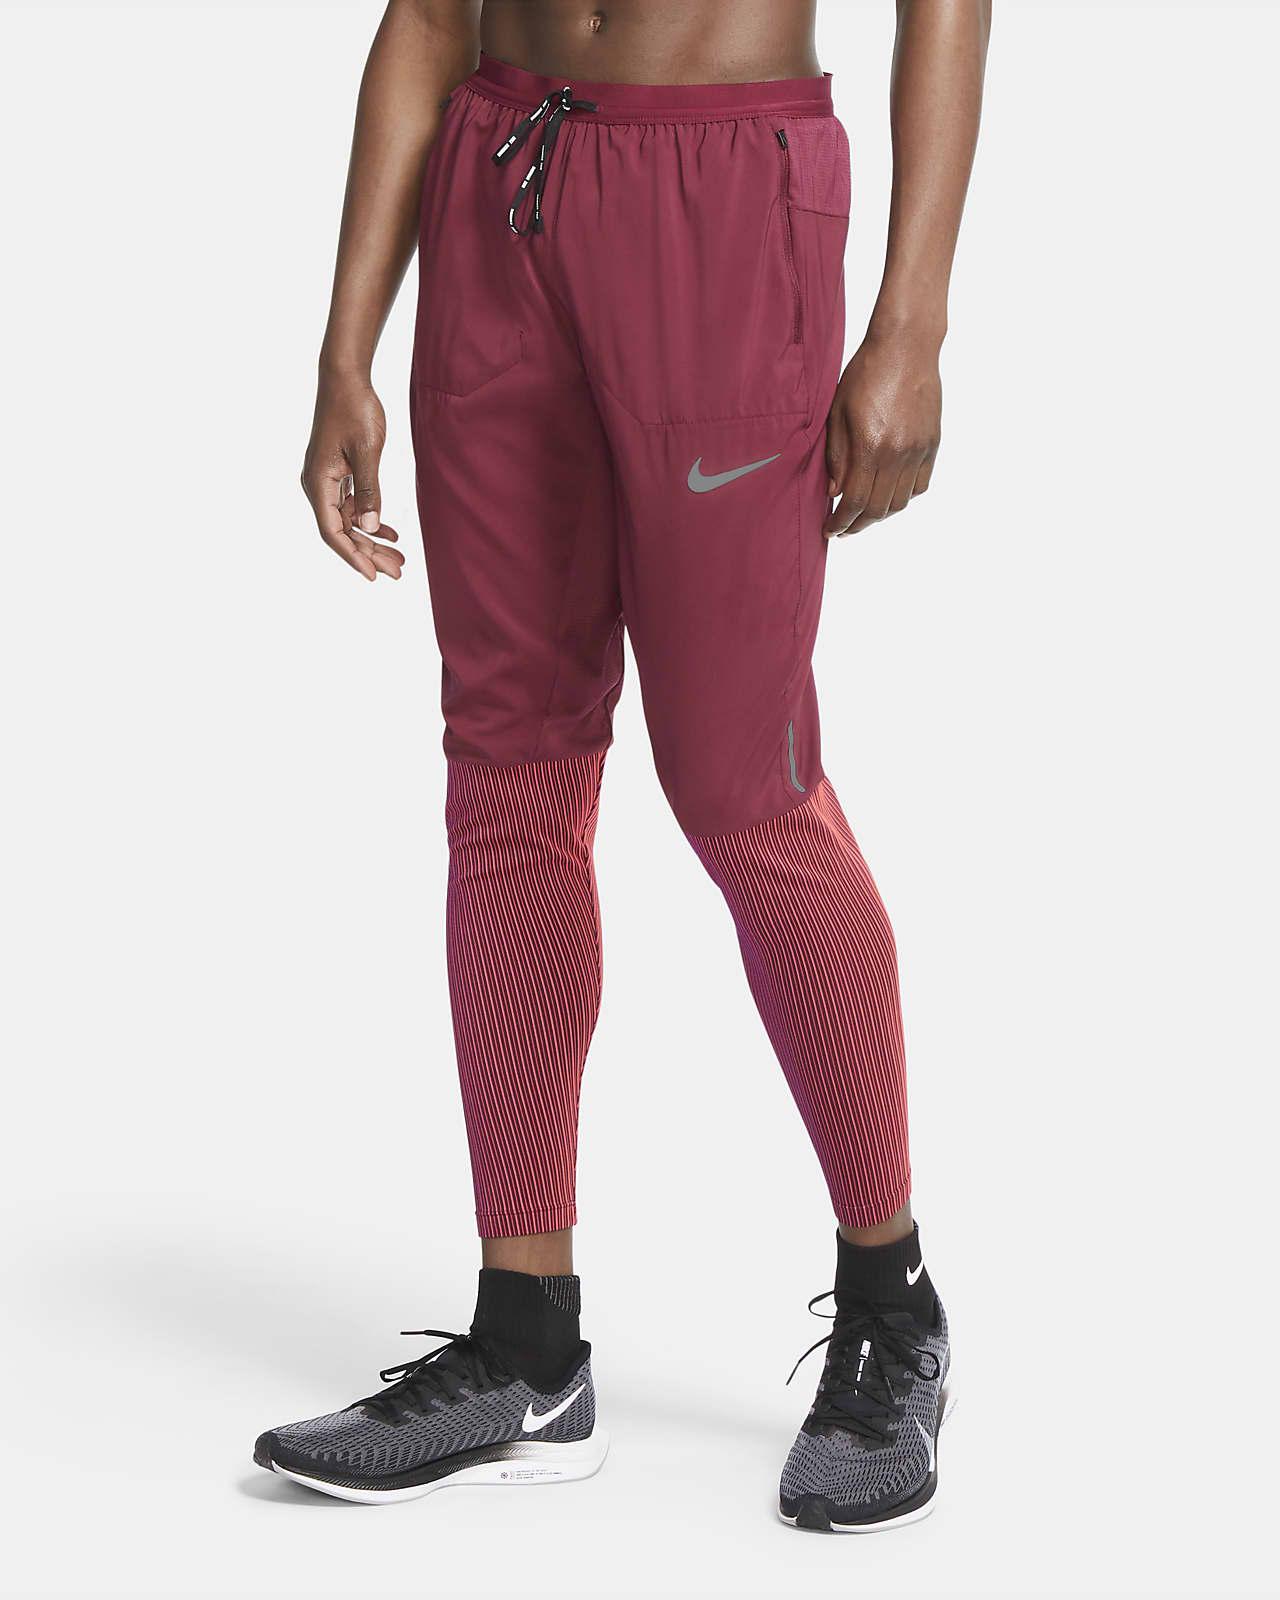 Nike Phenom Elite Future Fast Men's Hybrid Running Pants